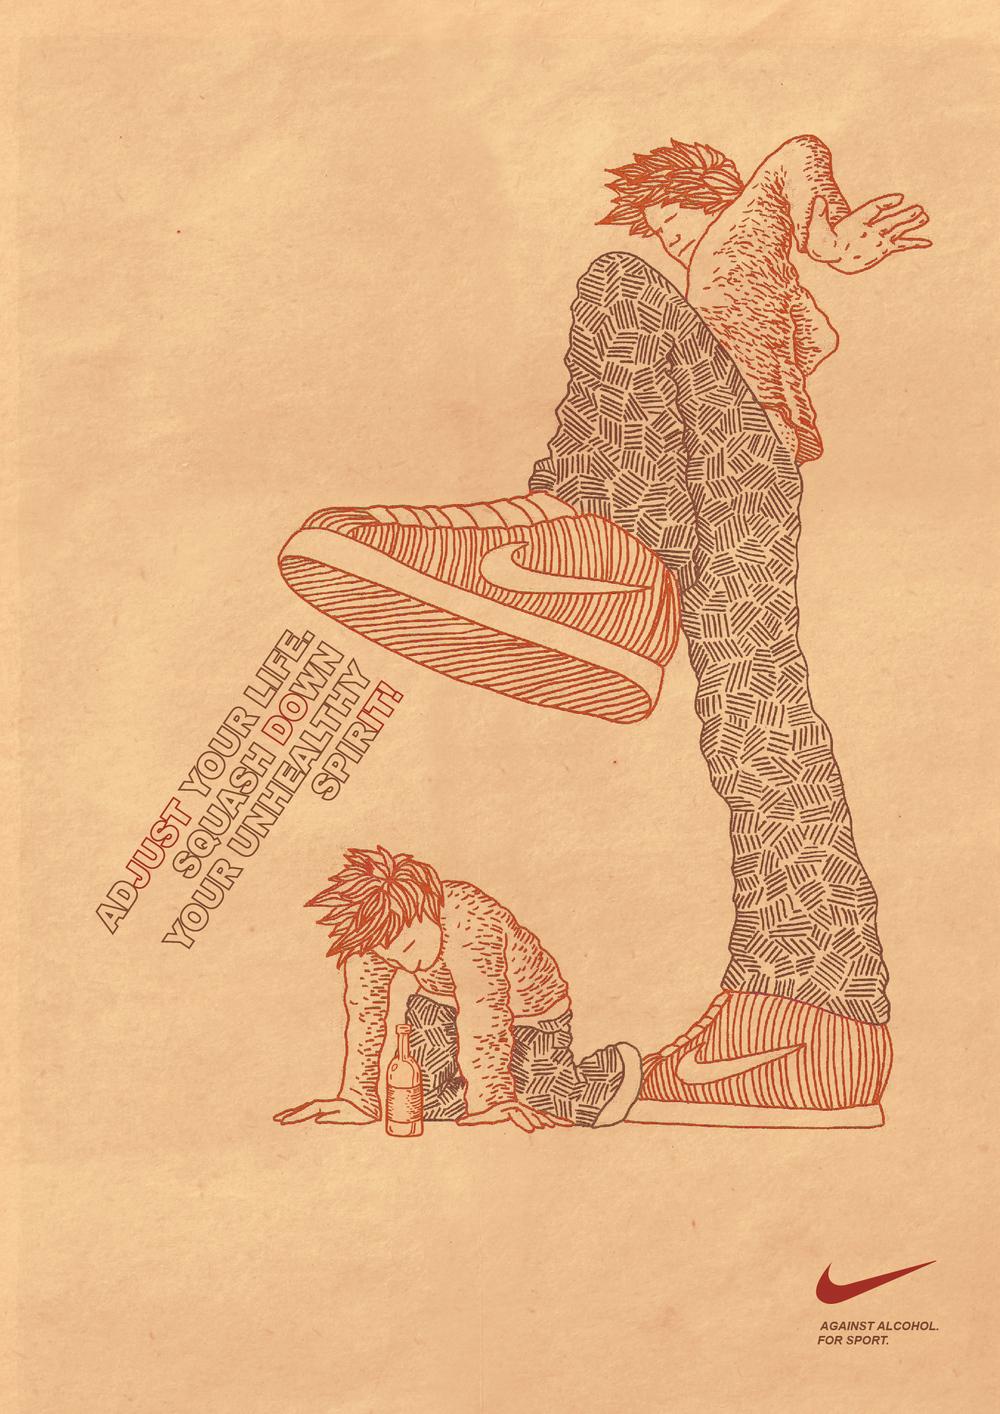 Nike-Bad-Habbit-Campaign-01.jpg